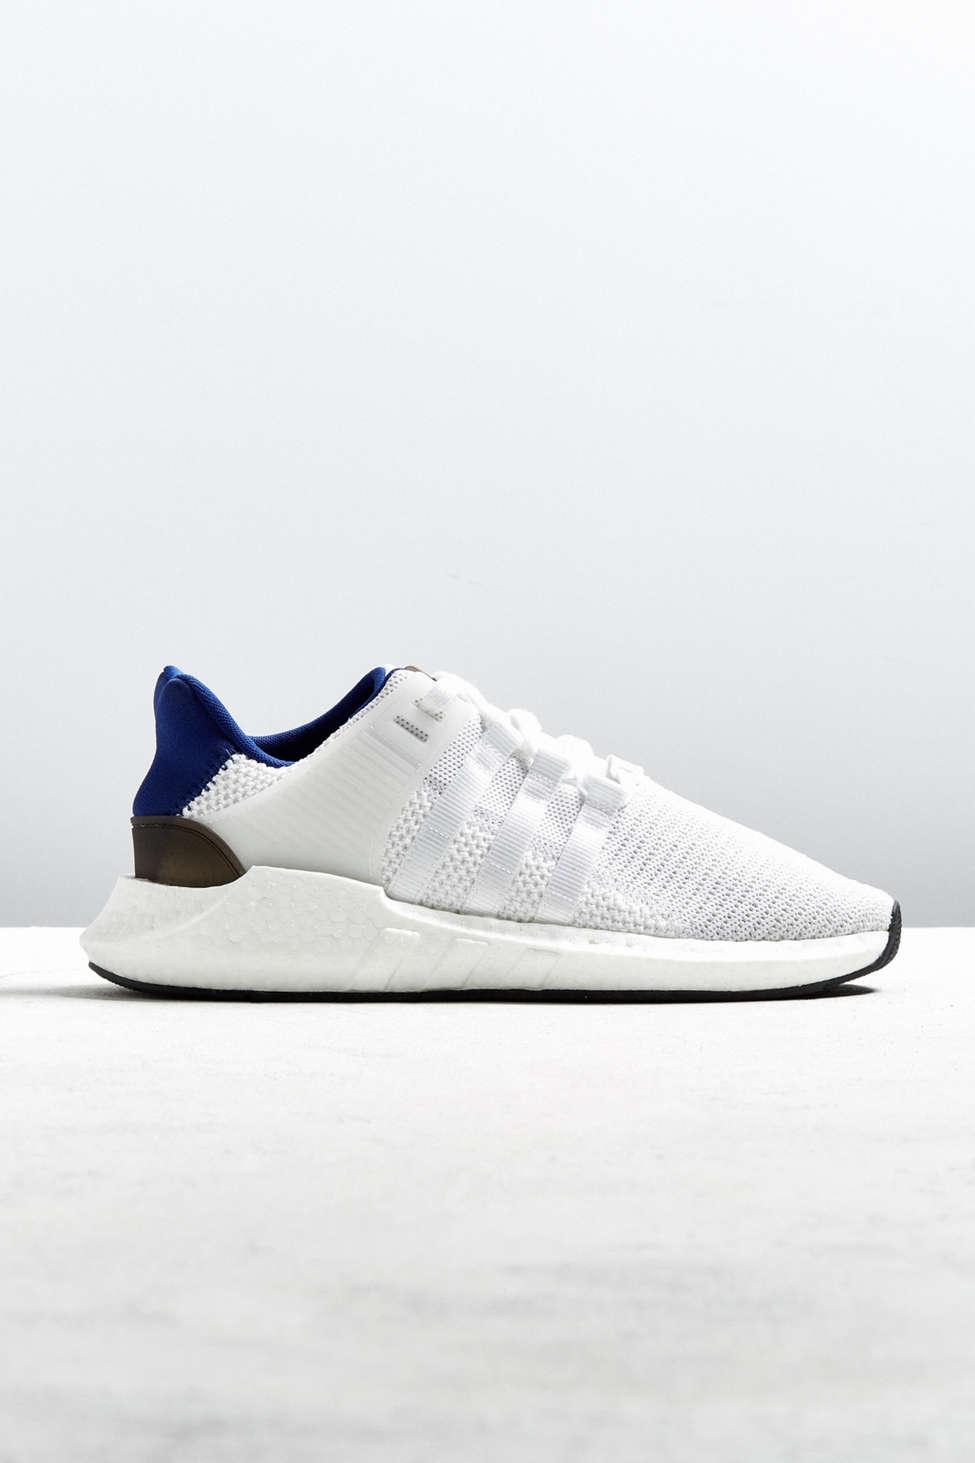 adidas eqt sostegno 93 / 17   blu bianco scarpe urban outfitters